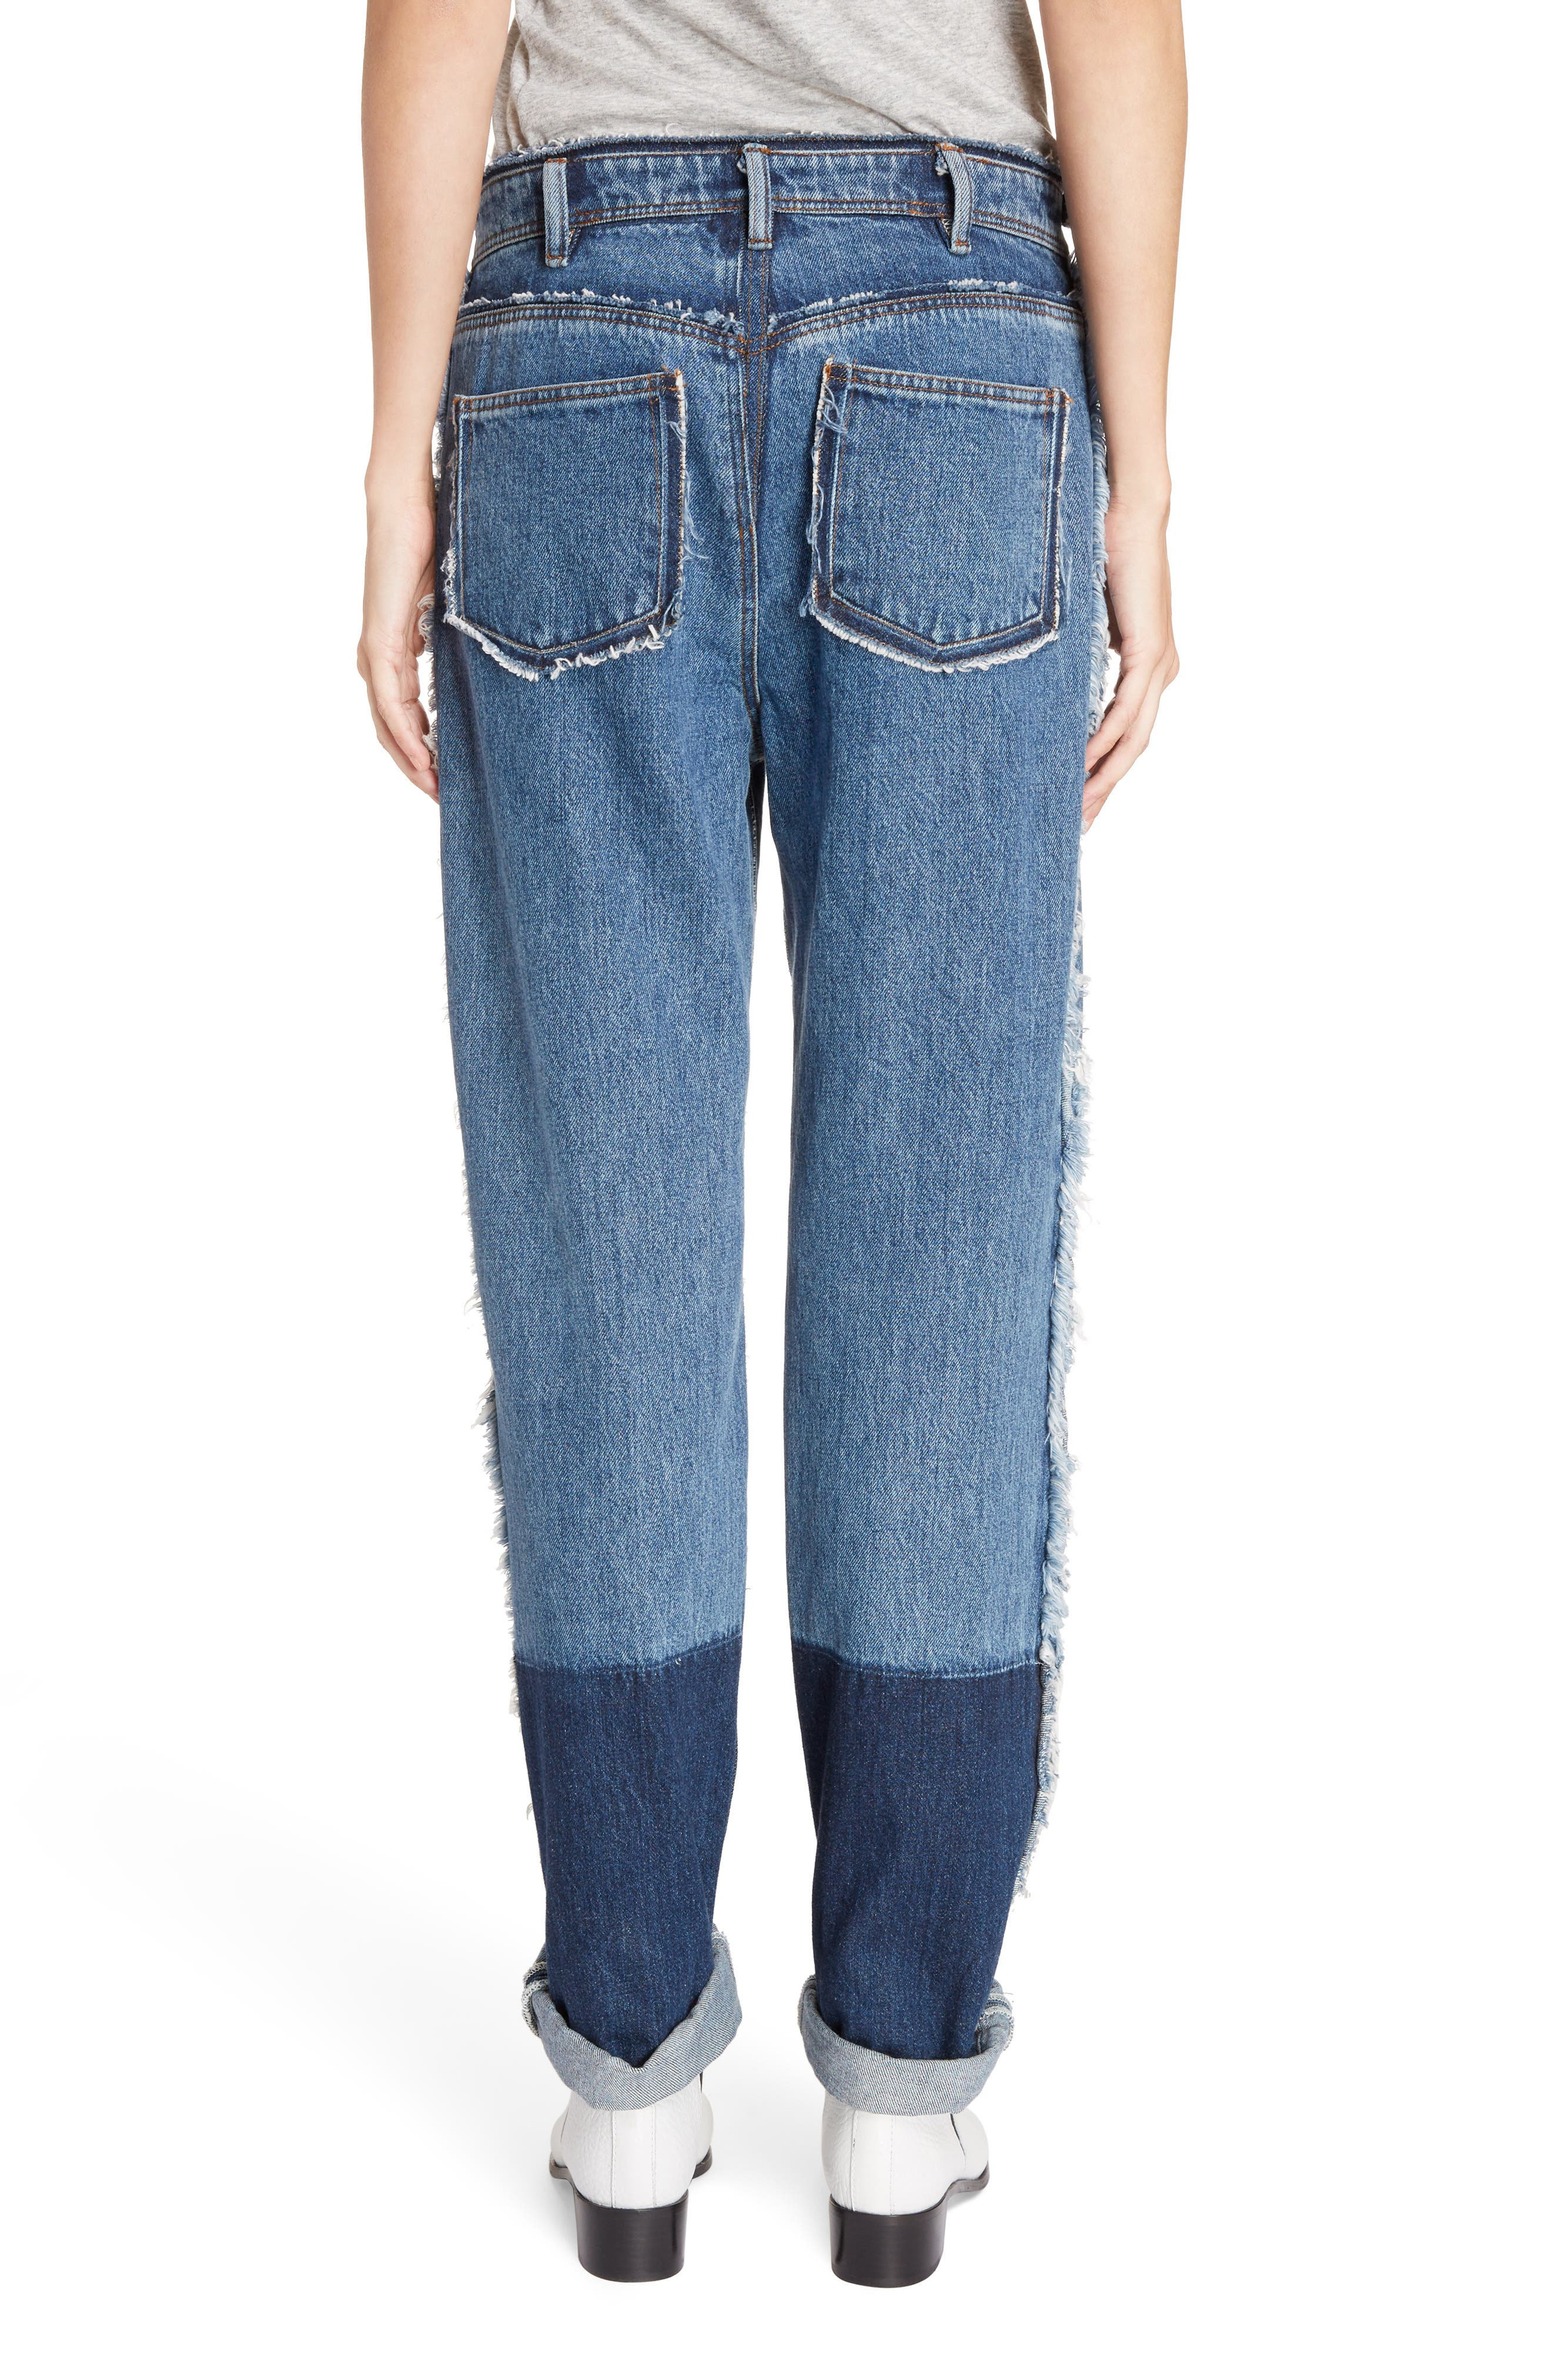 Mirja Frayed High Waist Straight Leg Jeans,                             Alternate thumbnail 3, color,                             Indigo Blue